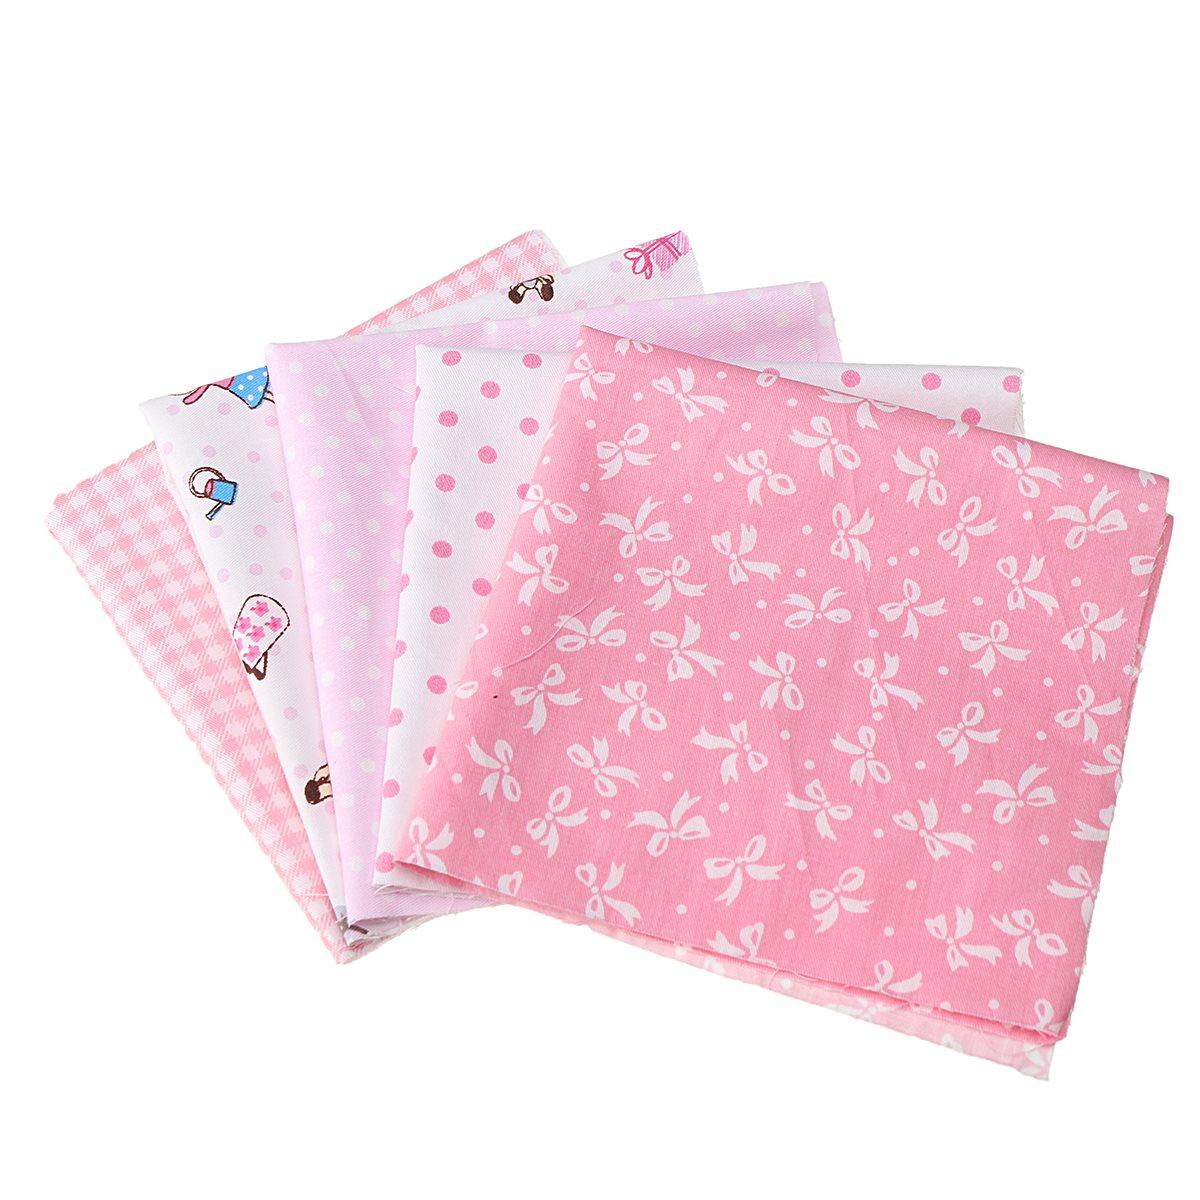 5Pcs/Set Assorted Sewing Pink Charm Cloth DIY Handmade Squares Cotton Fabrics Home Coffee Shop Table Decor Textiles 25*25CM(China (Mainland))